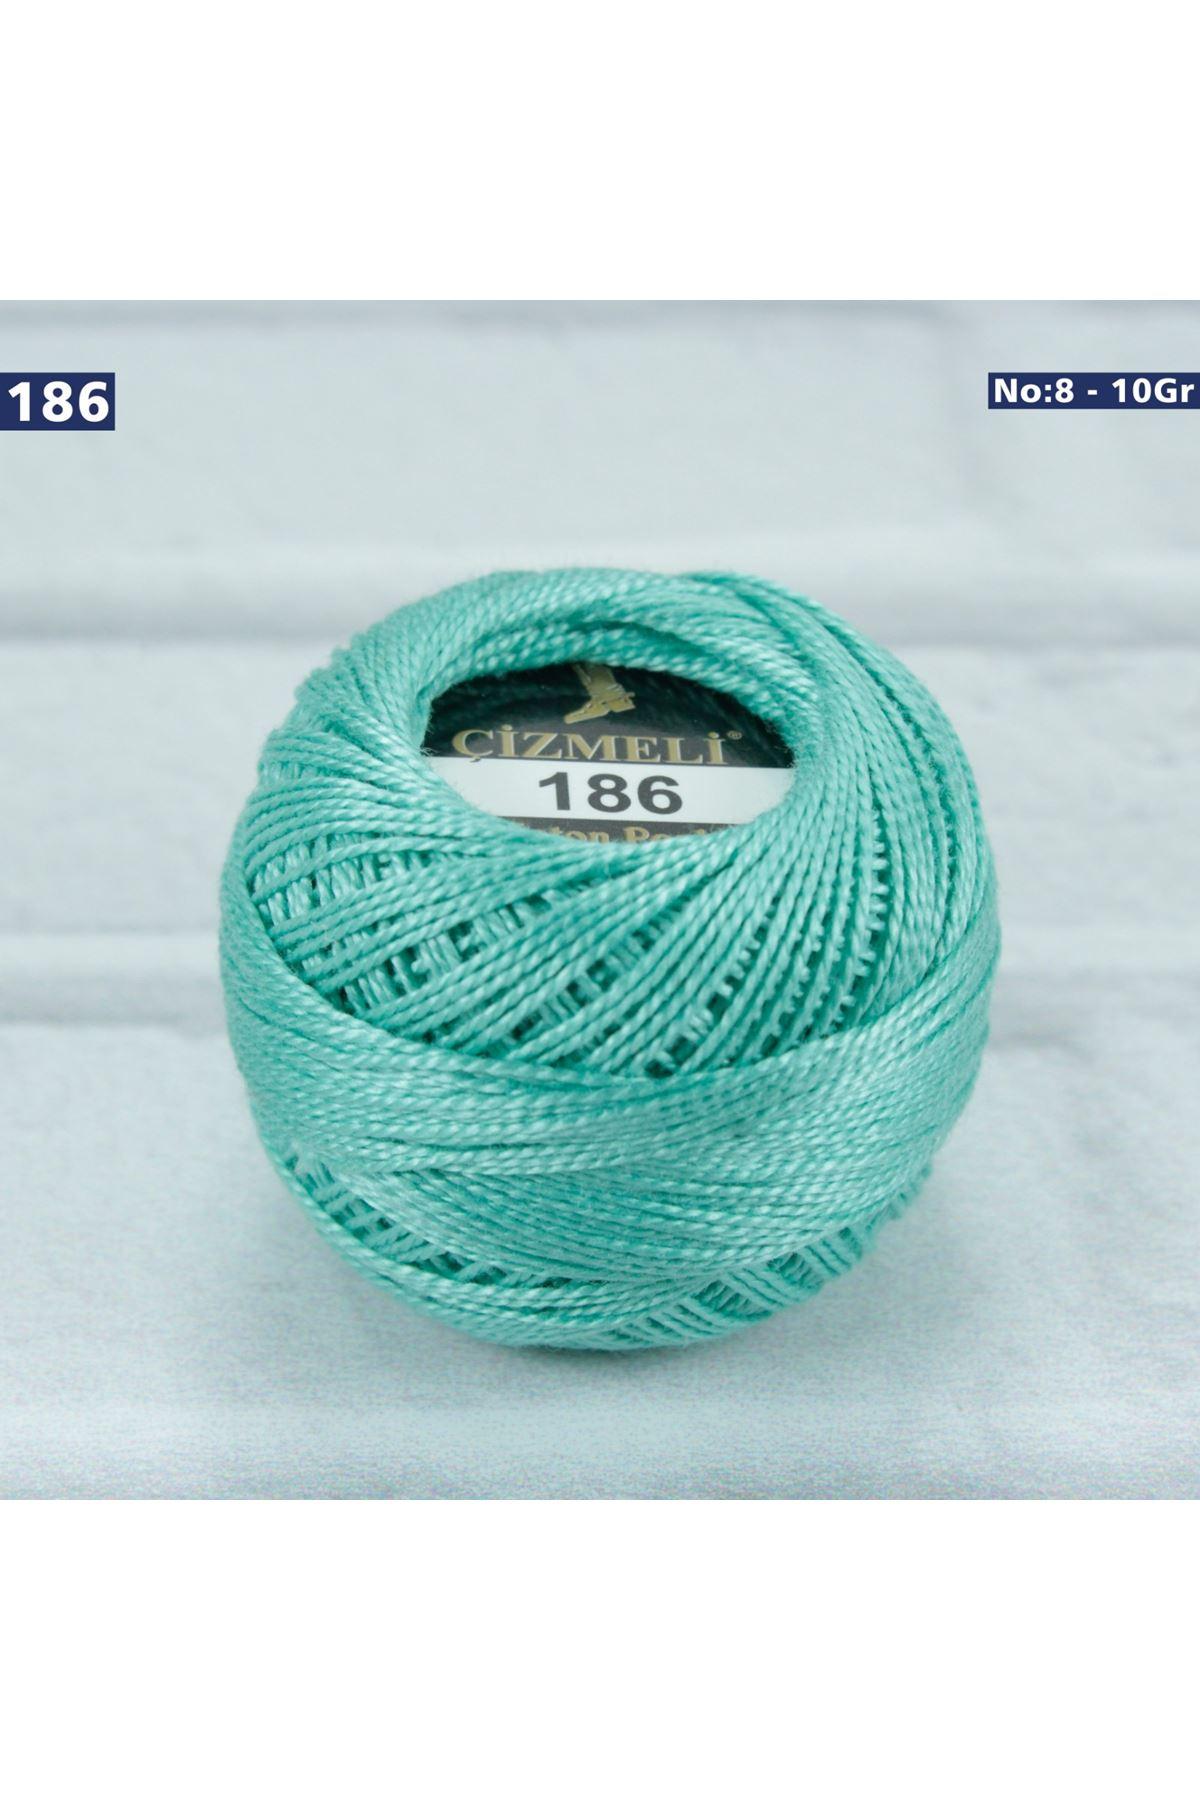 Çizmeli Cotton Perle Nakış İpliği No: 186